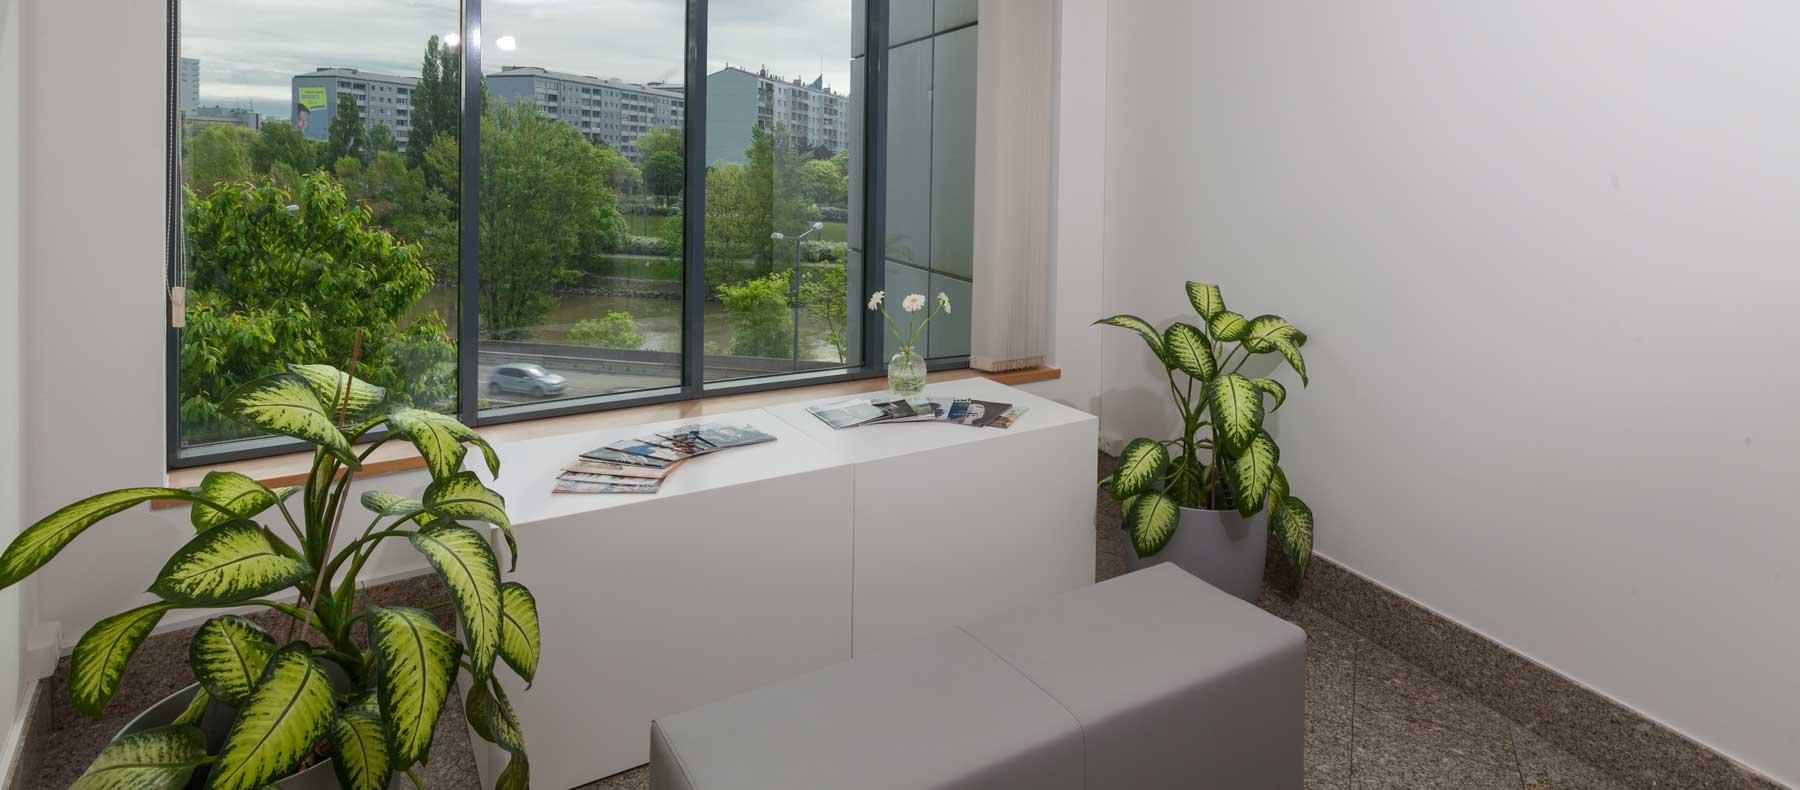 Toller Ausblick 1190 Wien Büros